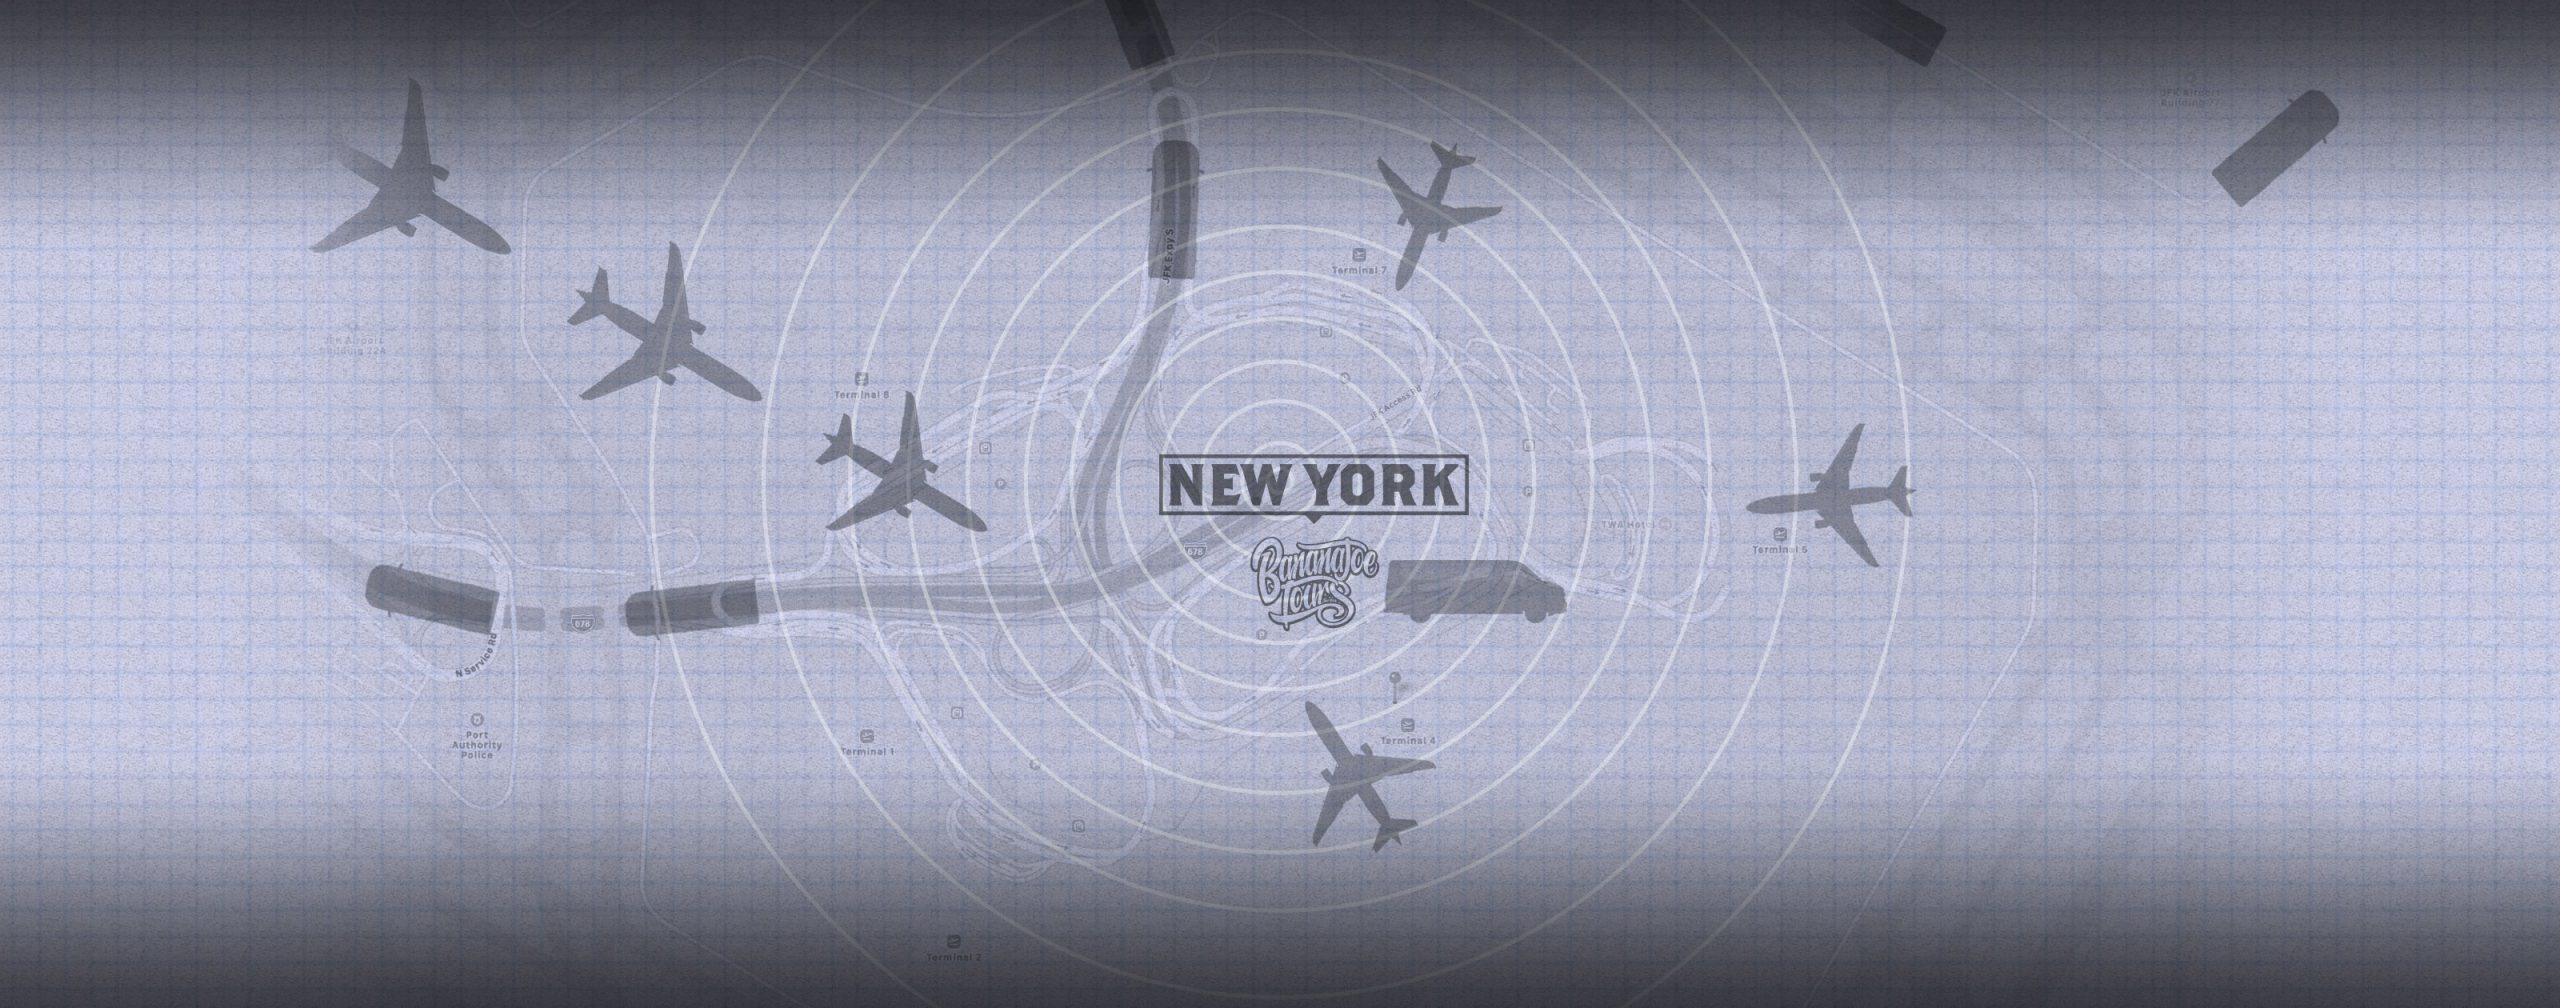 banana-joe-tours-new-york-transfers